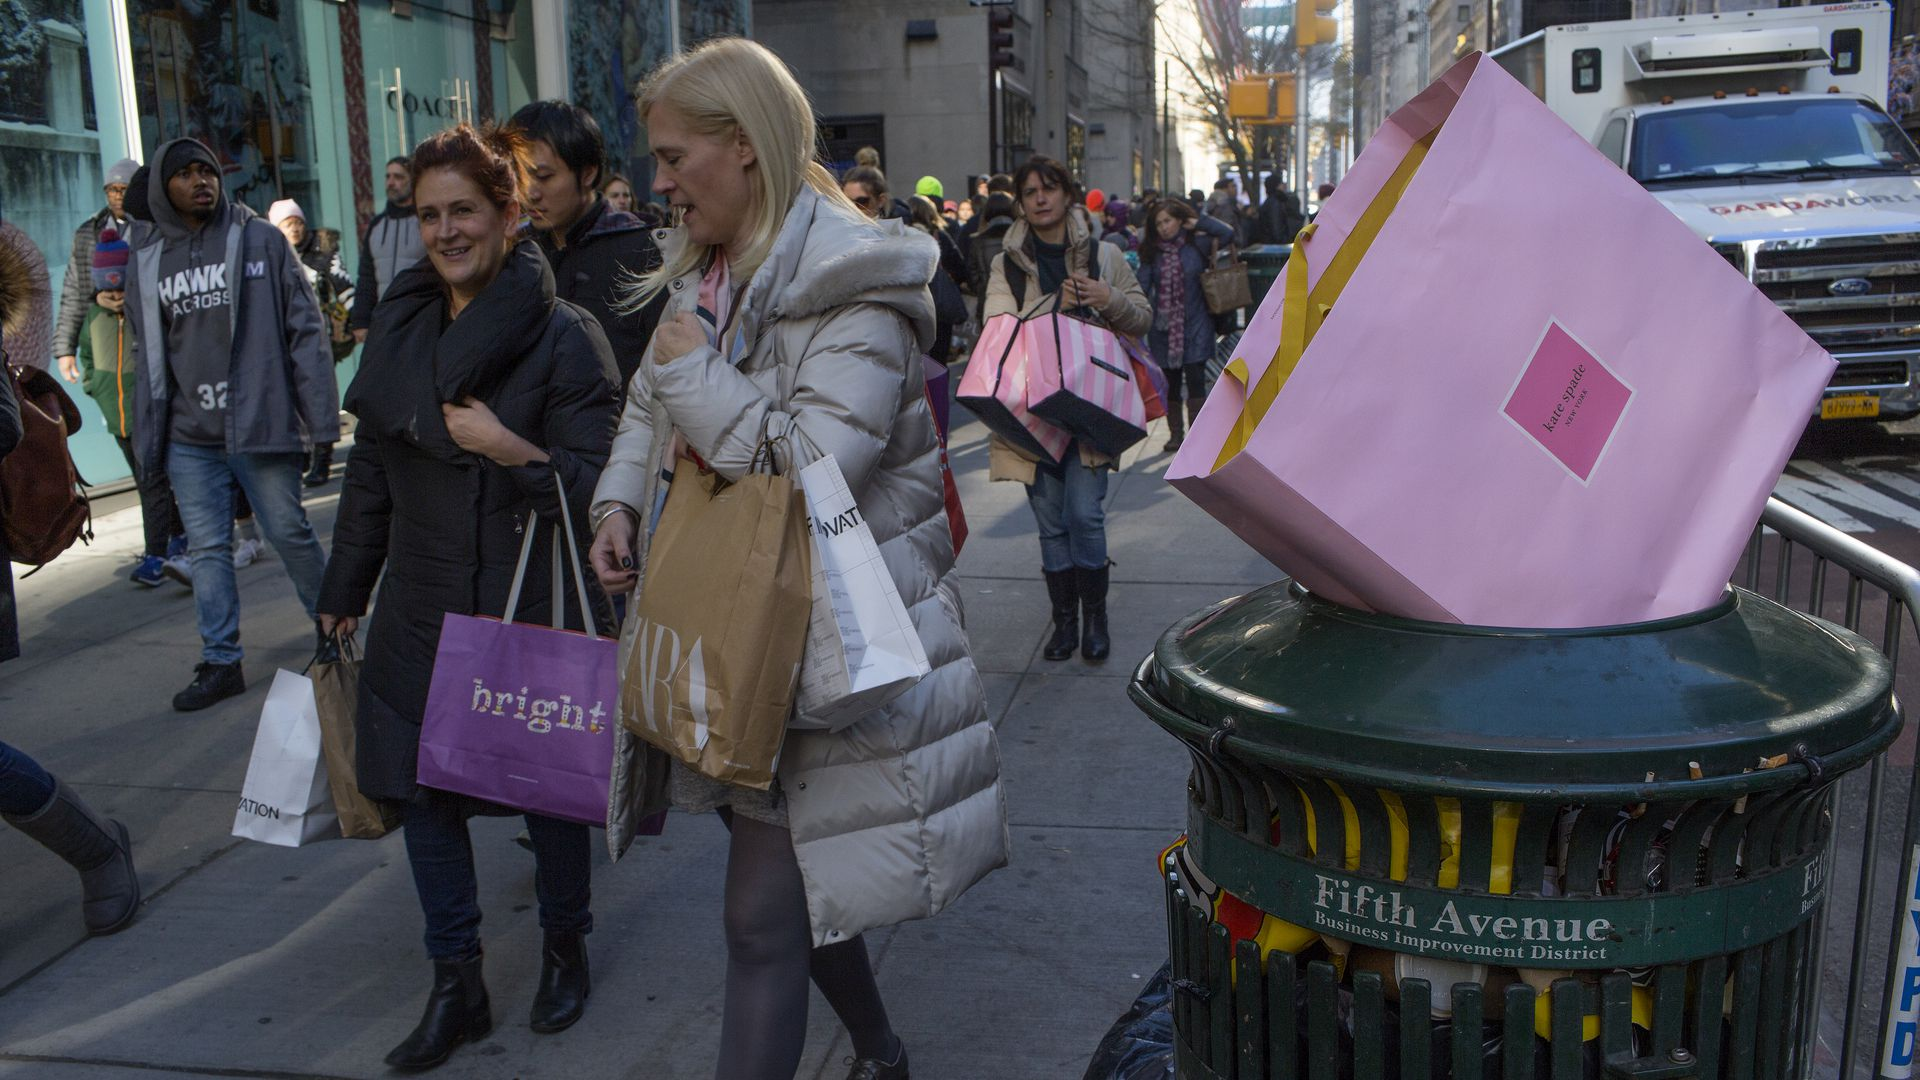 U.S. holiday retail sales slumped in November